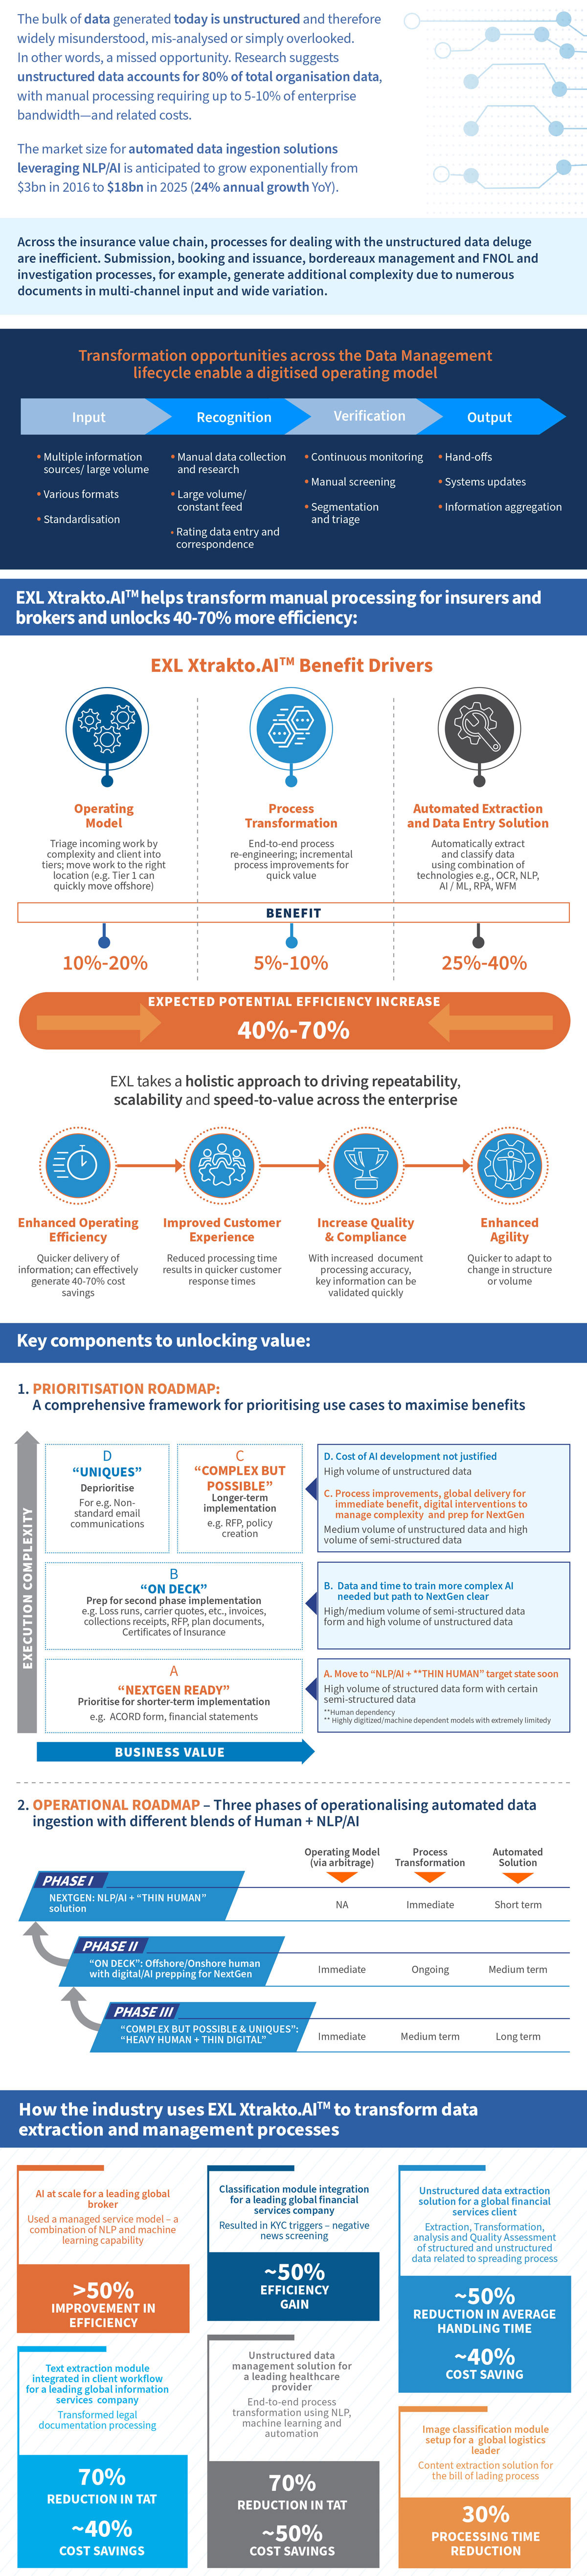 EXL Xtrakto.AI™ - Proprietary Intelligent Framework Transforms Insurance Operations